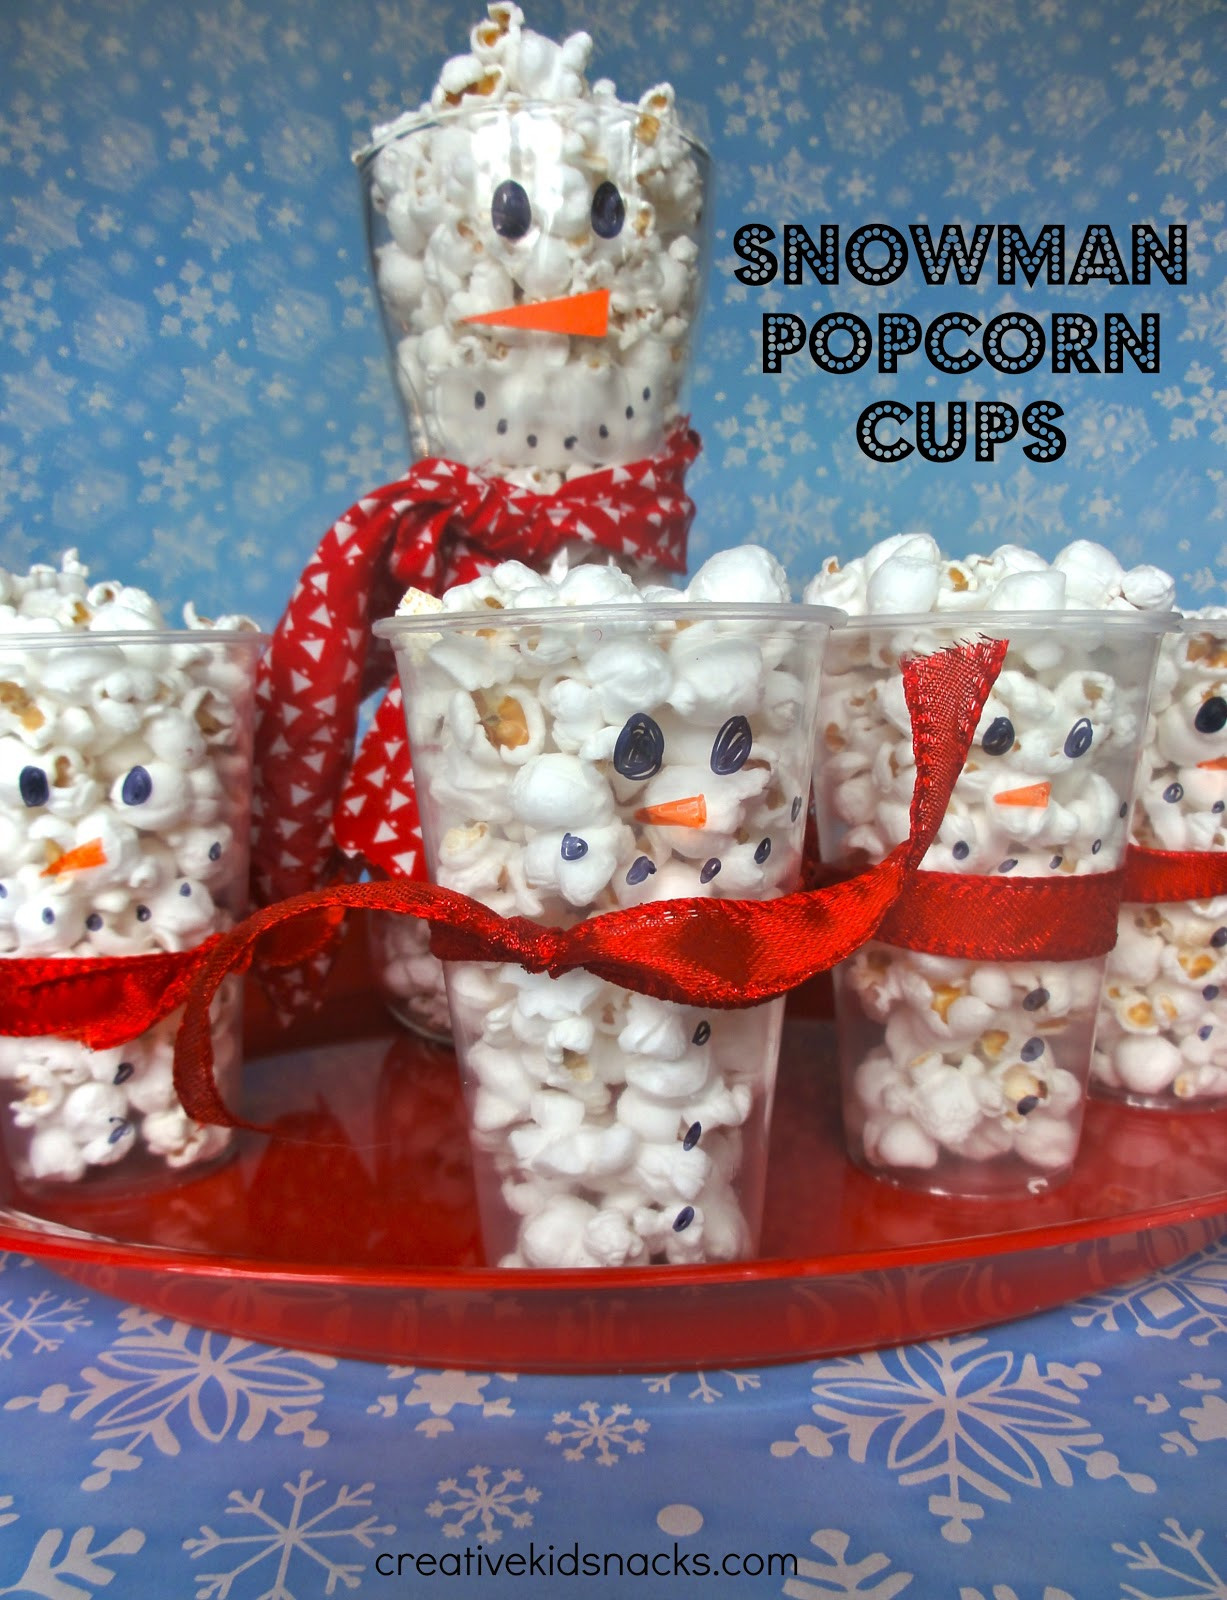 School Christmas Party Ideas  Creative Kid Snacks